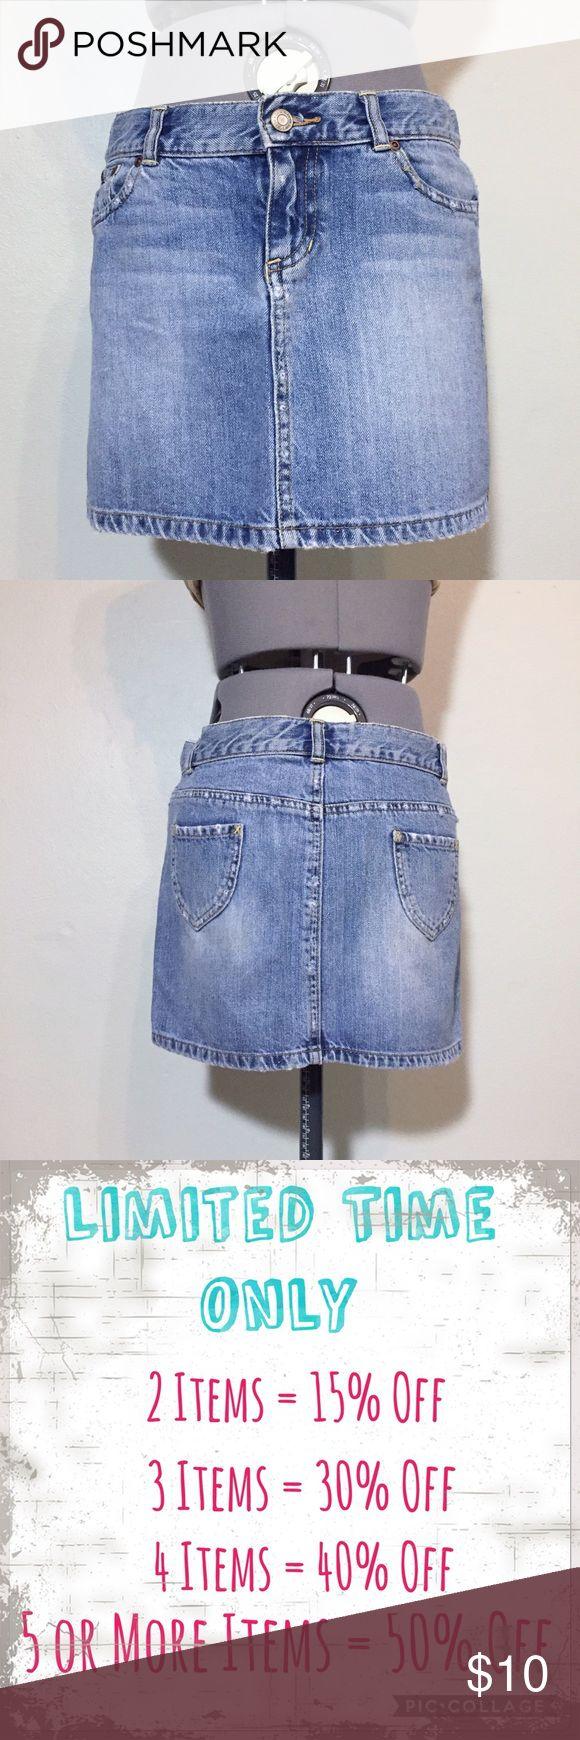 "Old Navy Denim Jean Mini Skirt Old Navy Denim Jean Mini Skirt. Juniors size 1 measures flat: 15"" across top, 17"" across hips, 13"" long. 100% cotton. 716/25/072417 Old Navy Skirts Mini"